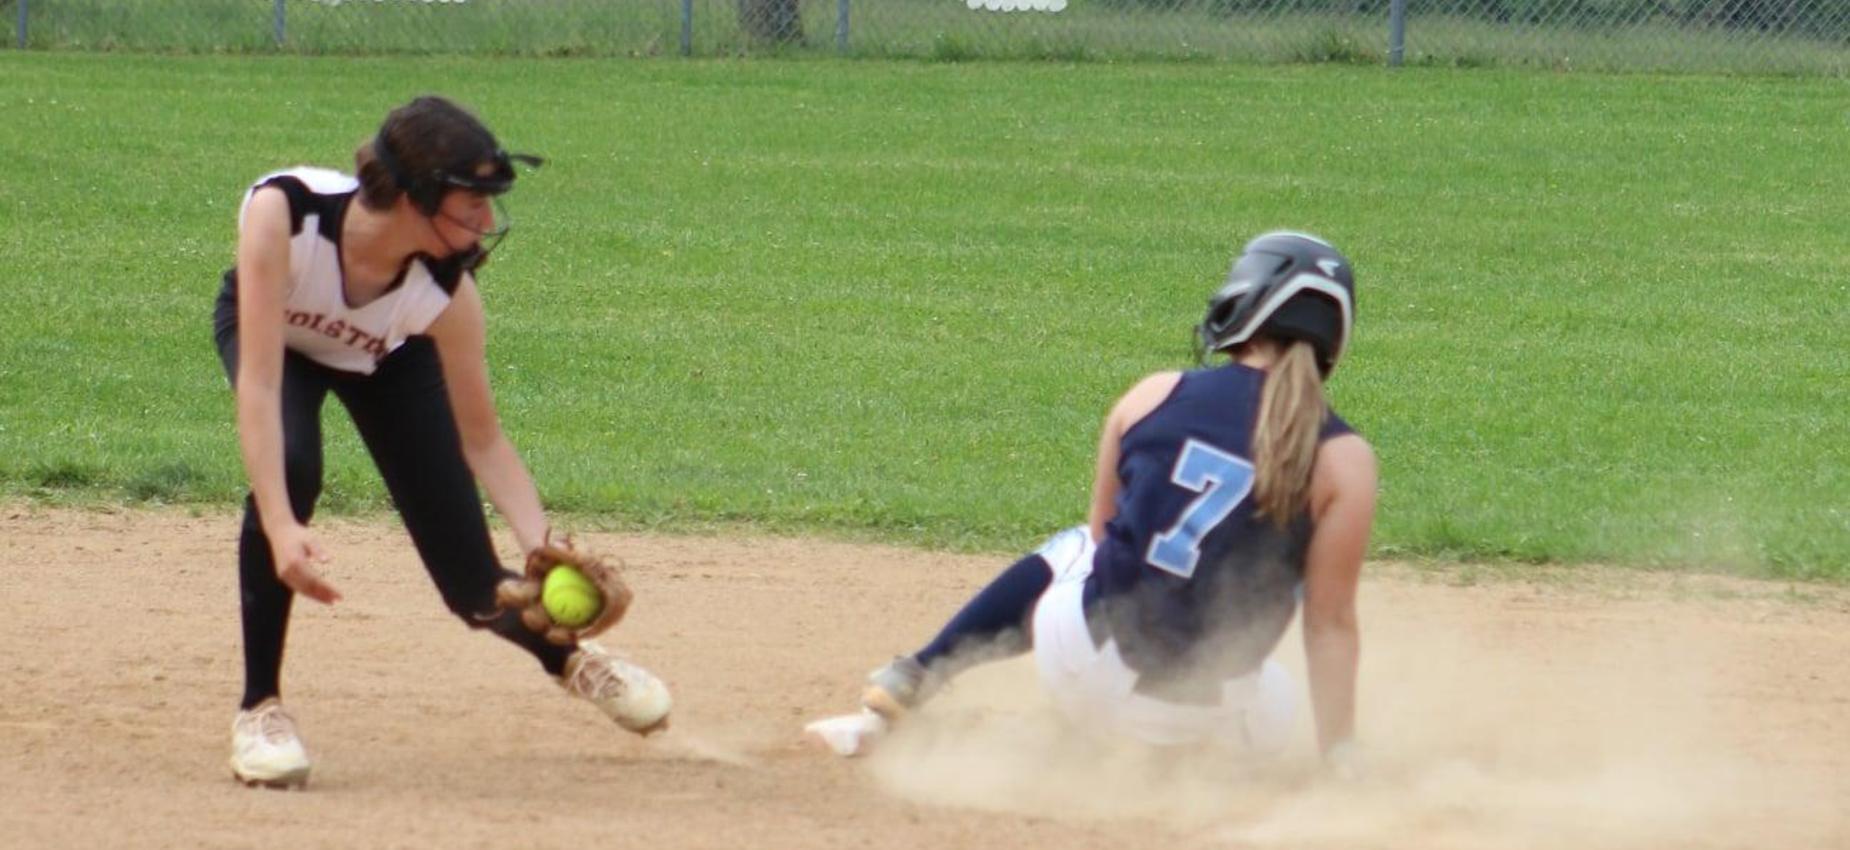 A softball player tags a runner.